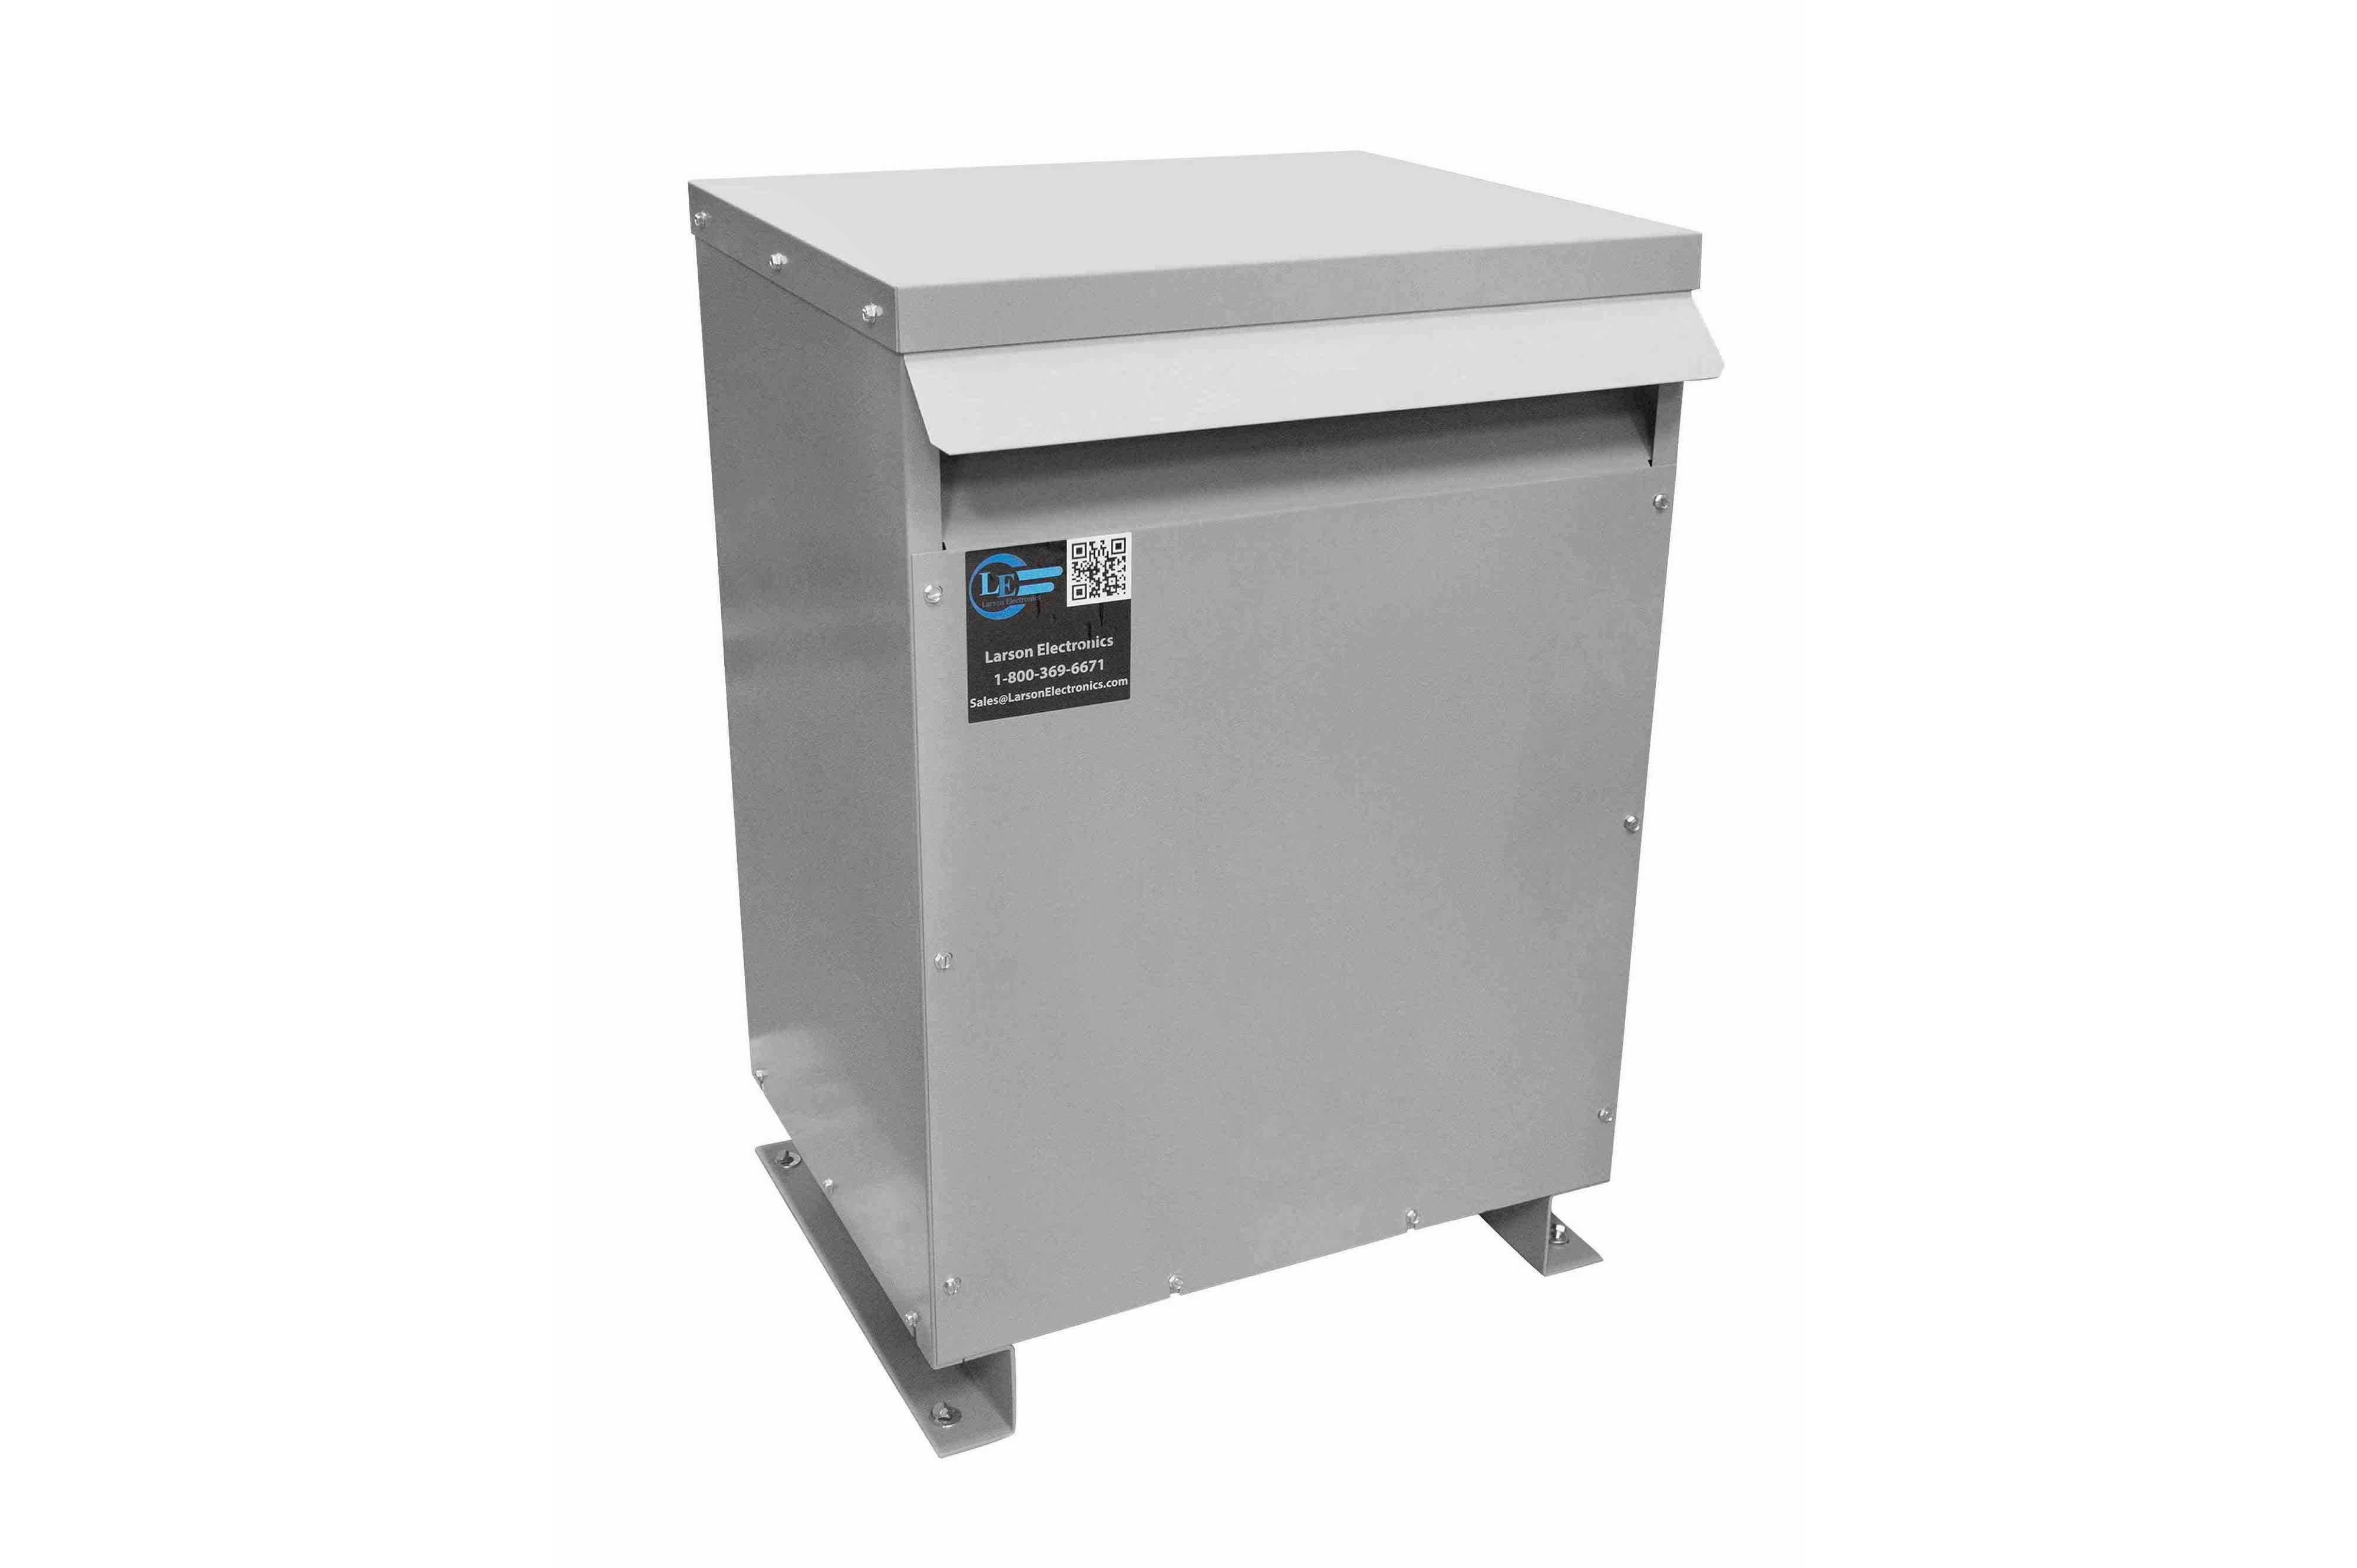 400 kVA 3PH Isolation Transformer, 415V Wye Primary, 240V/120 Delta Secondary, N3R, Ventilated, 60 Hz